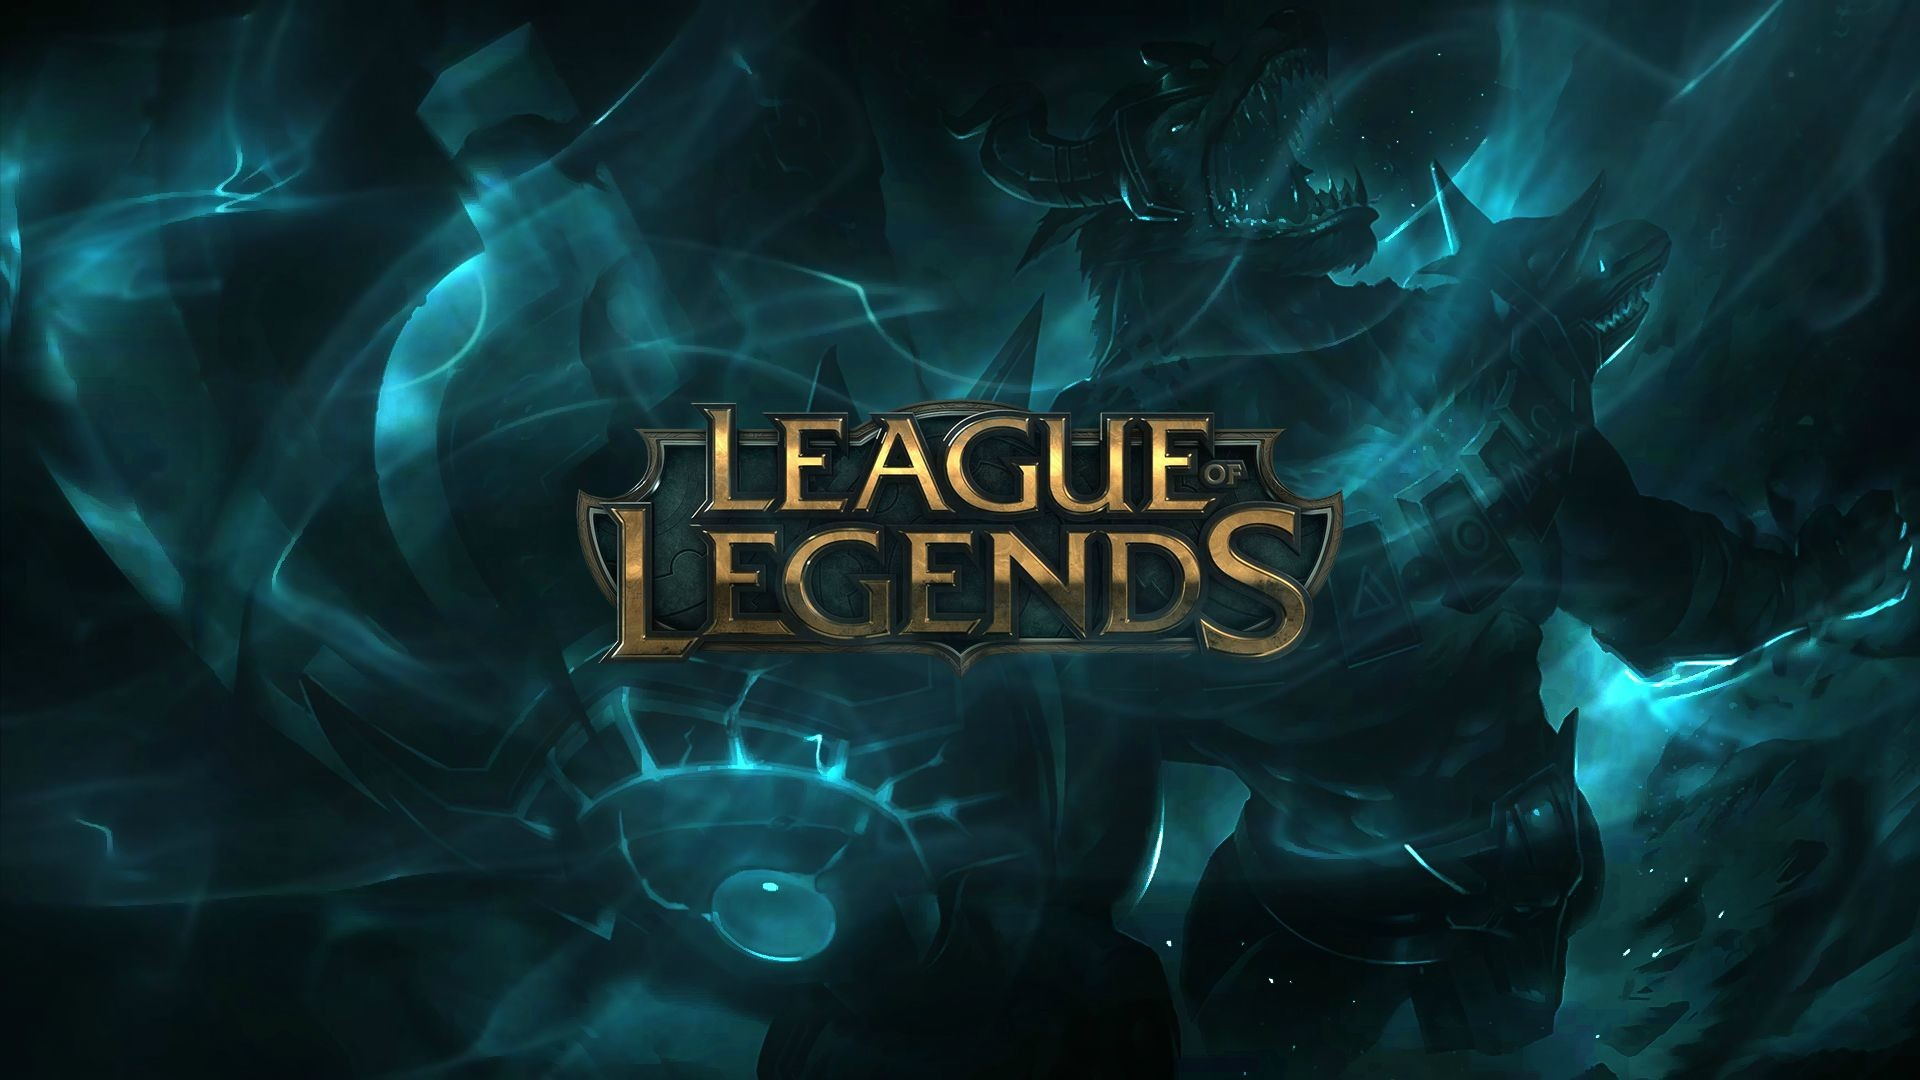 League Of Legends Desktop Wallpaper Posted By Sarah Walker